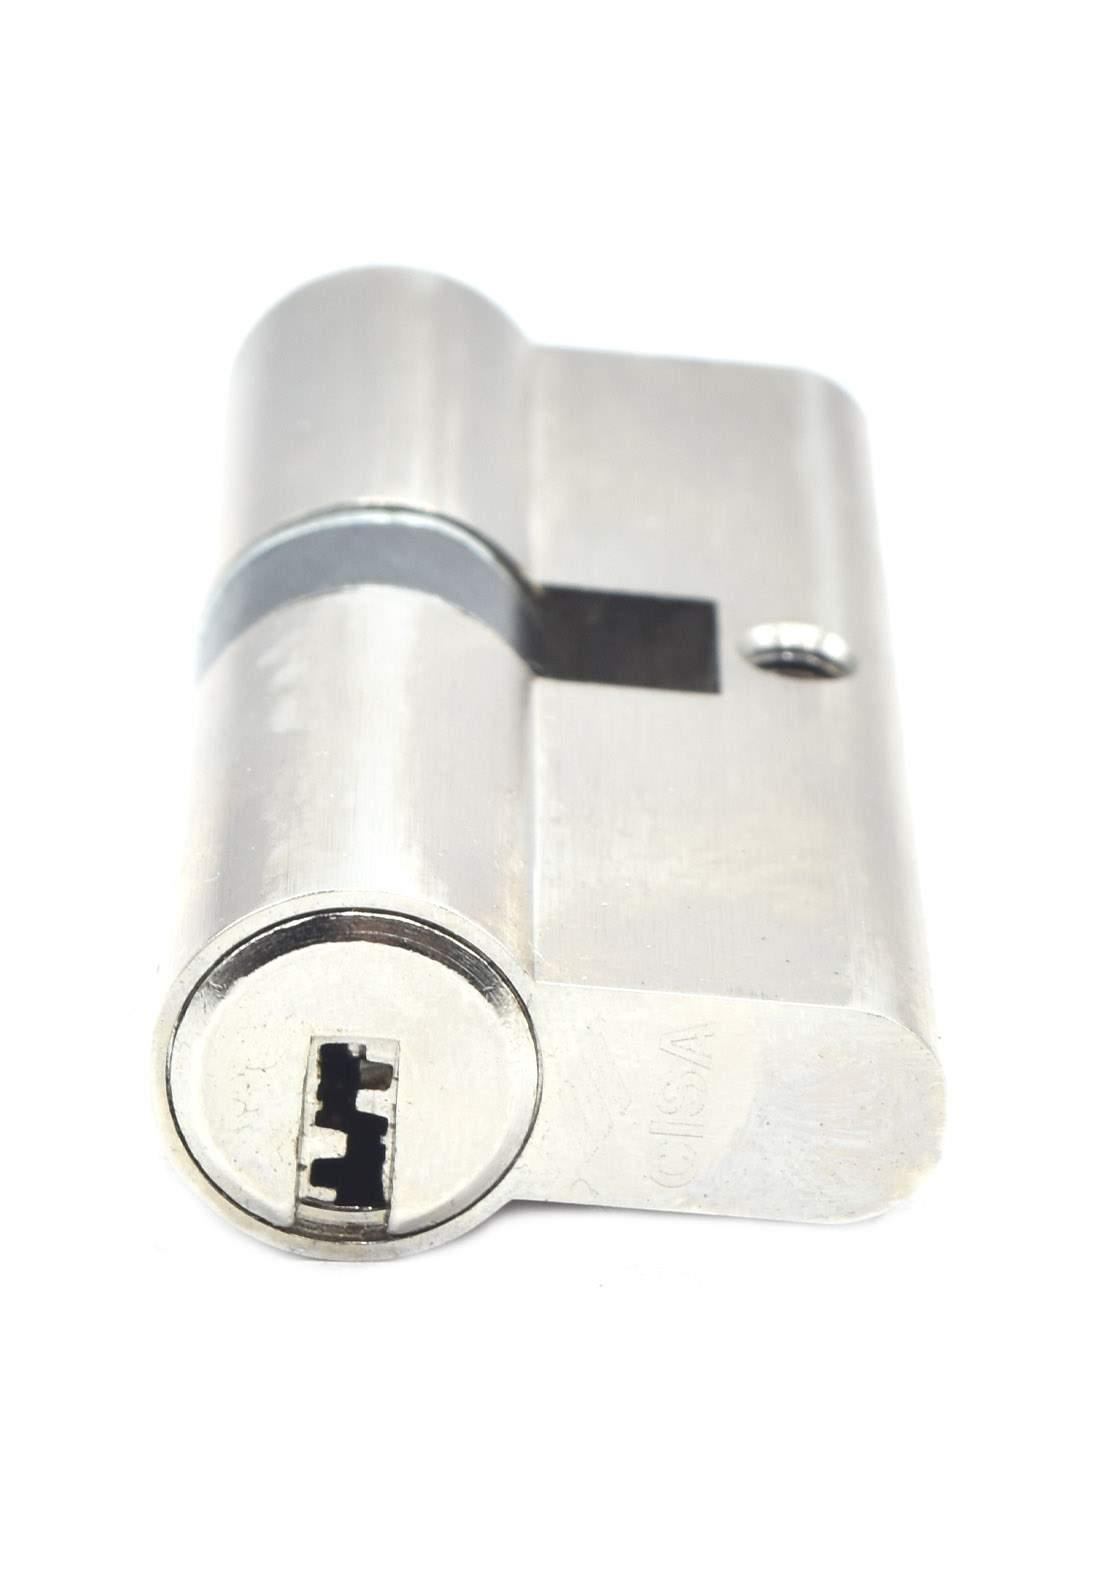 Cisa 0E300-13-012-00-C5 Door Lock 70 mm قفل باب جوزة